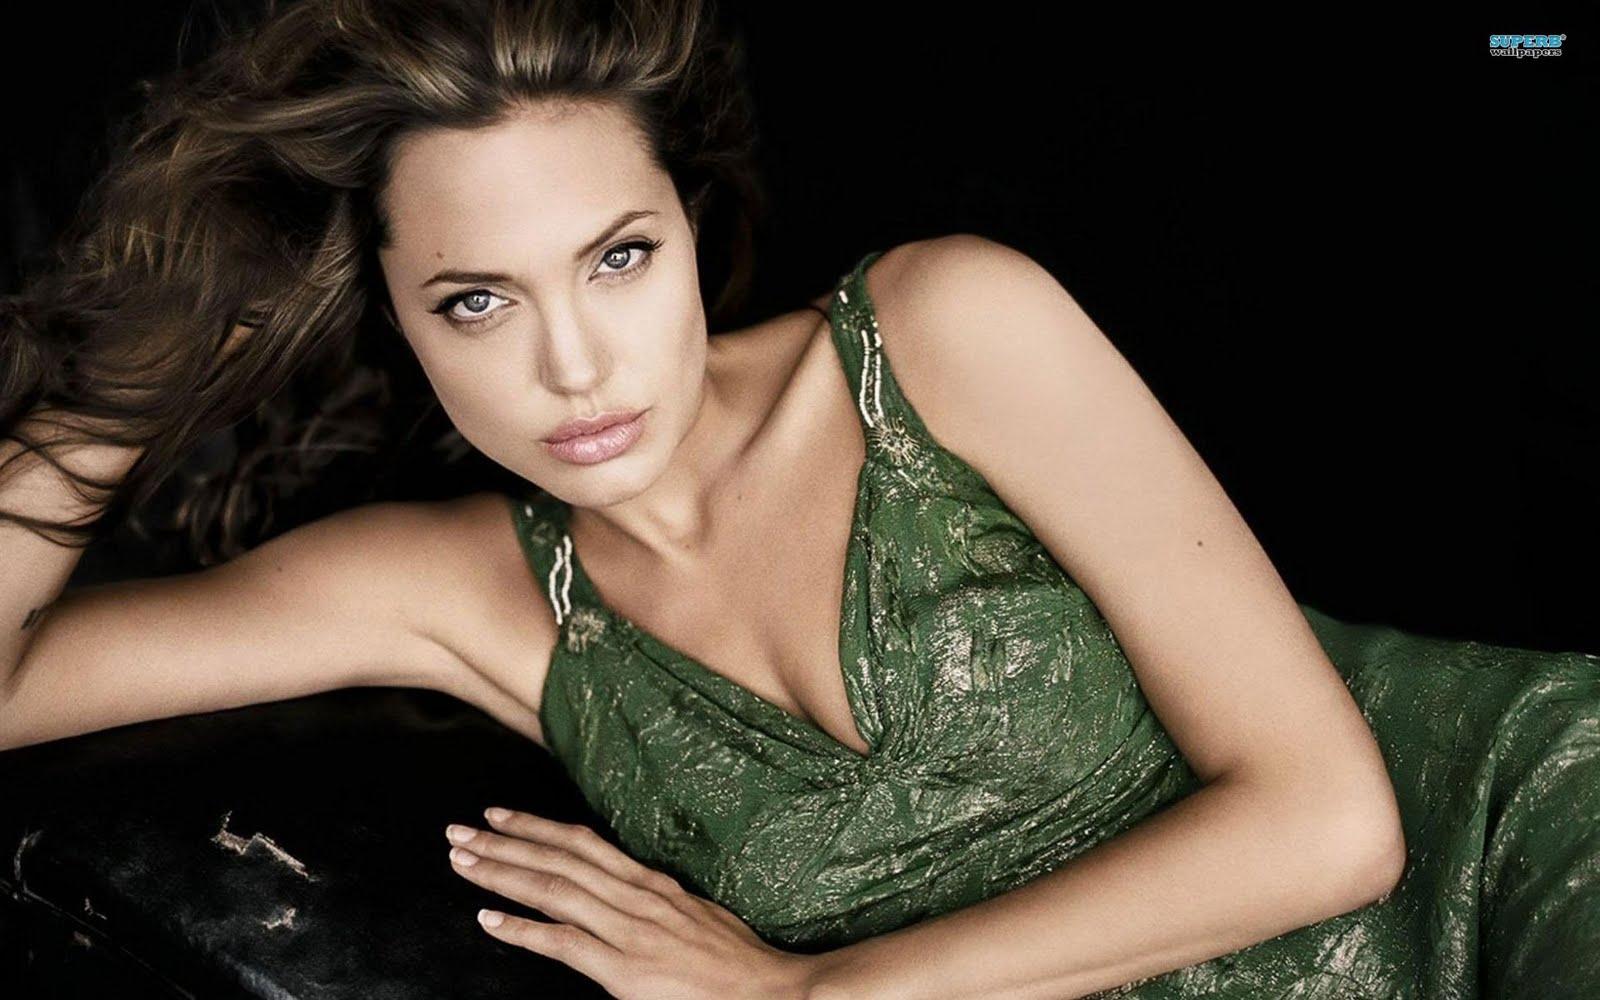 Signification Tatouage Angelina Jolie - Tatouage Angelina Jolie signification tatouages Angelina